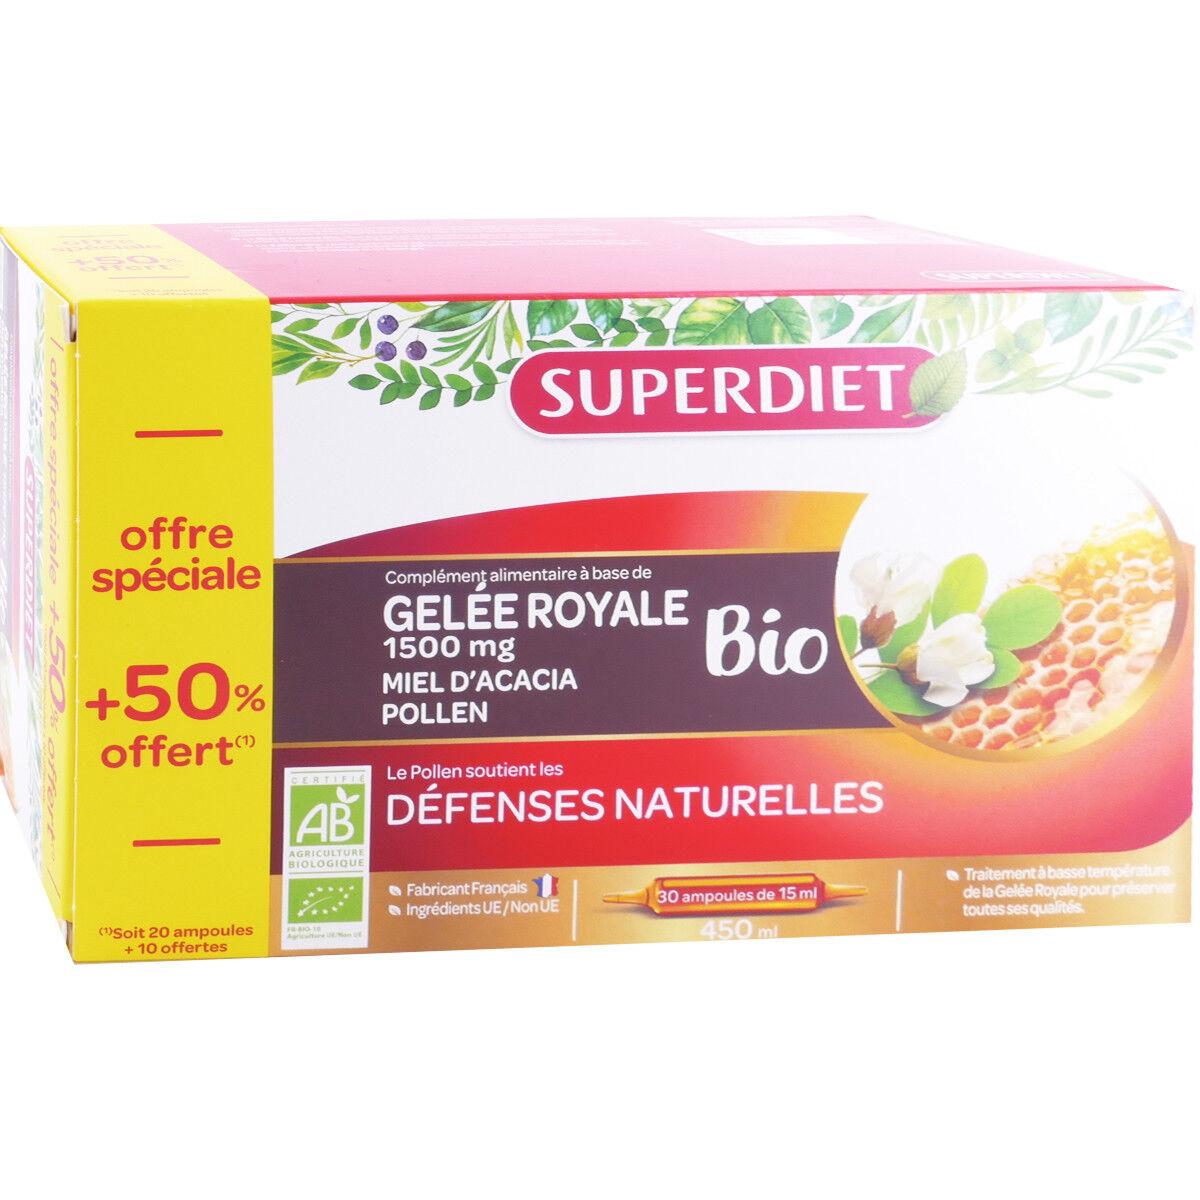 SUPER DIET Superdiet gelee royale bio 30 ampoules defenses naturelles